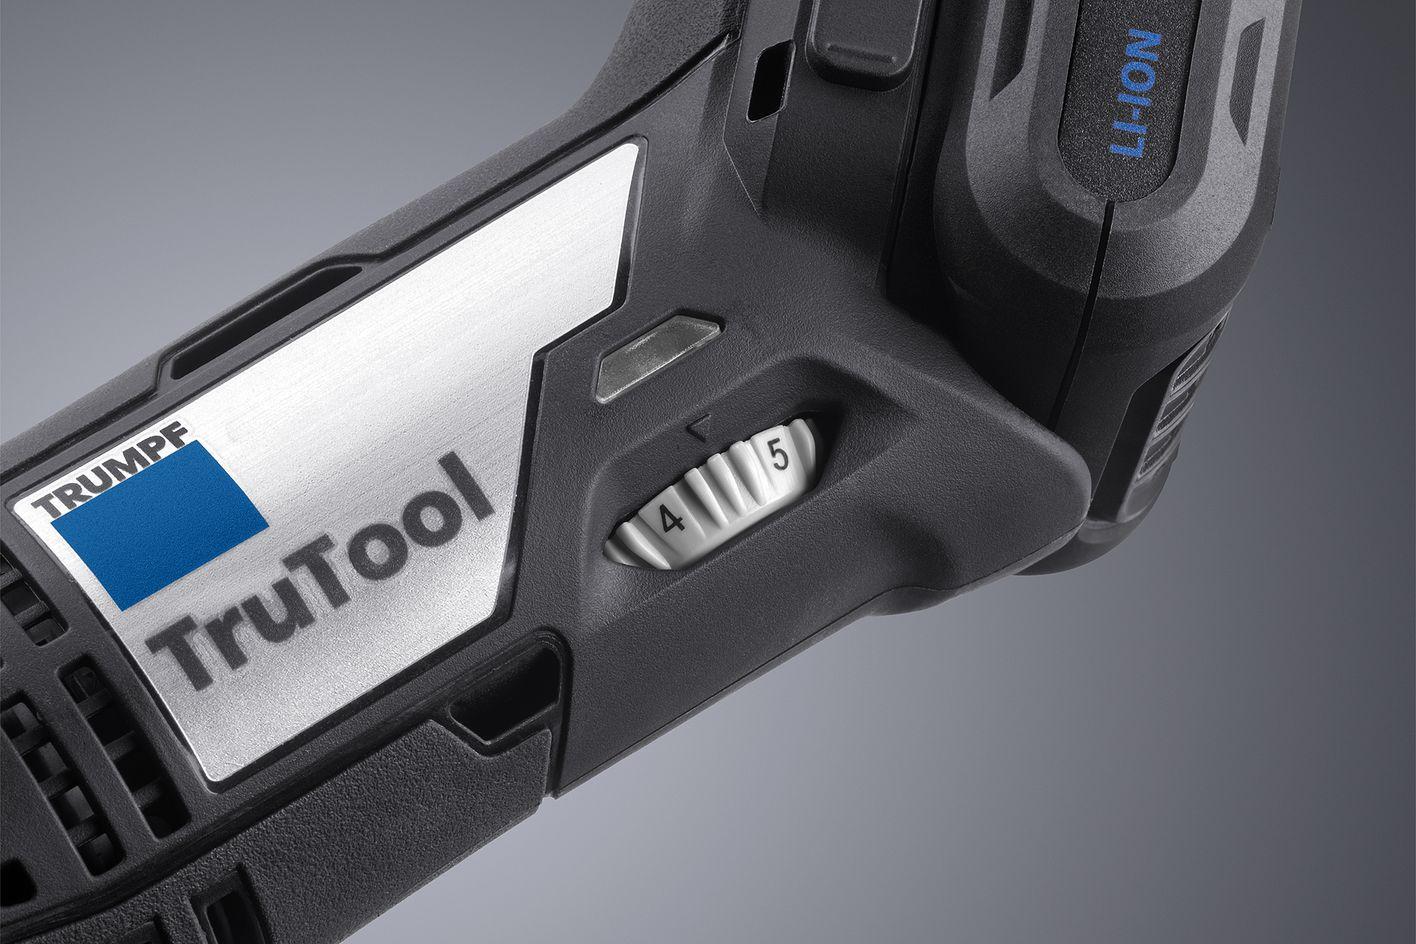 Battery-powered machine, speed control